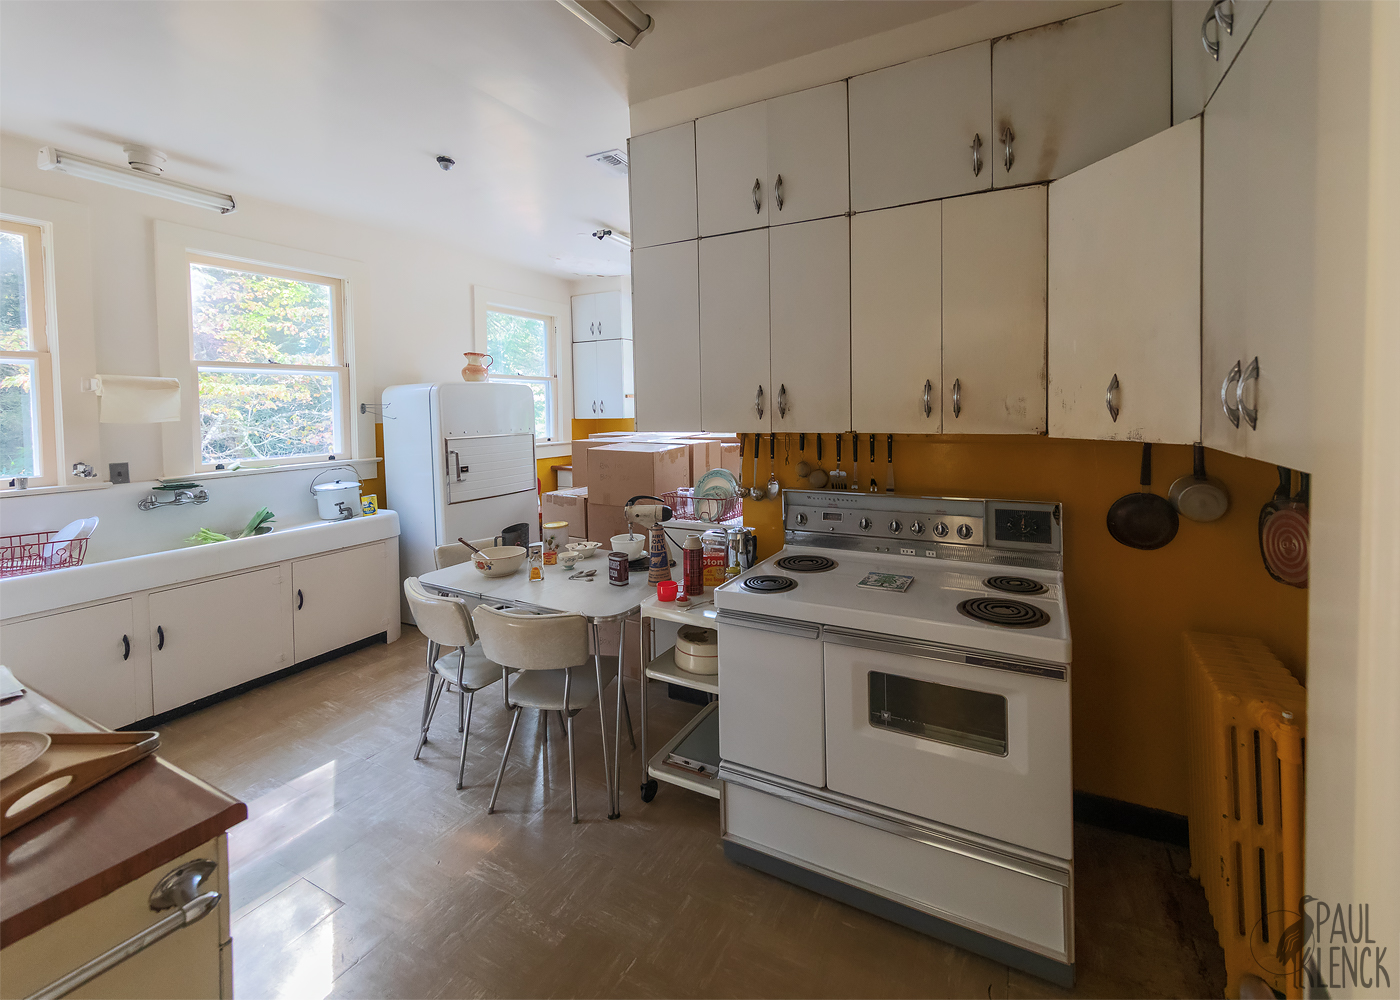 Kitchen, Carl Sandburg Home National Historic Site